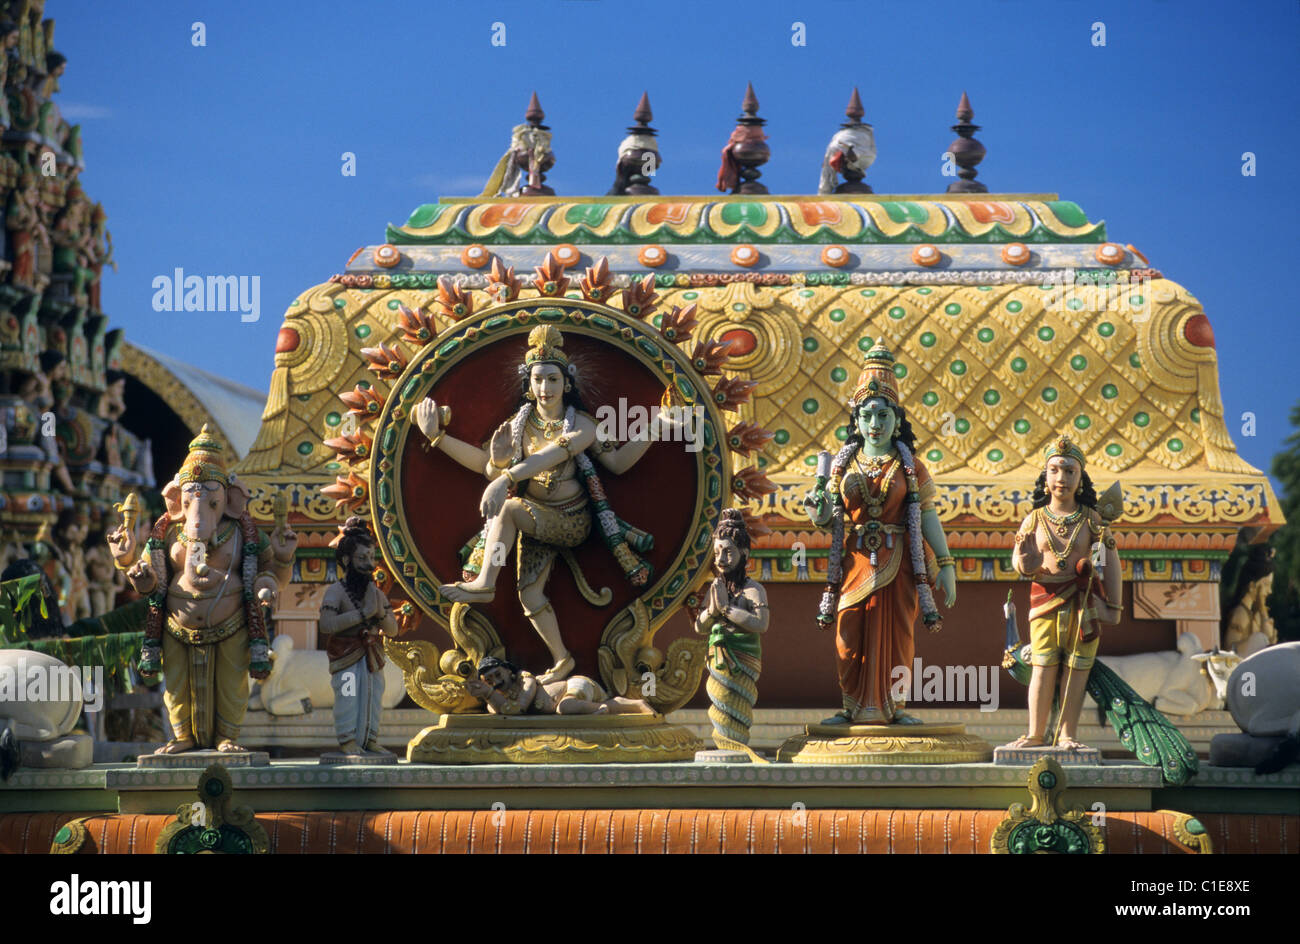 tamil temple saint denis la reunion island france indian ocean stock photo 35349734 alamy. Black Bedroom Furniture Sets. Home Design Ideas